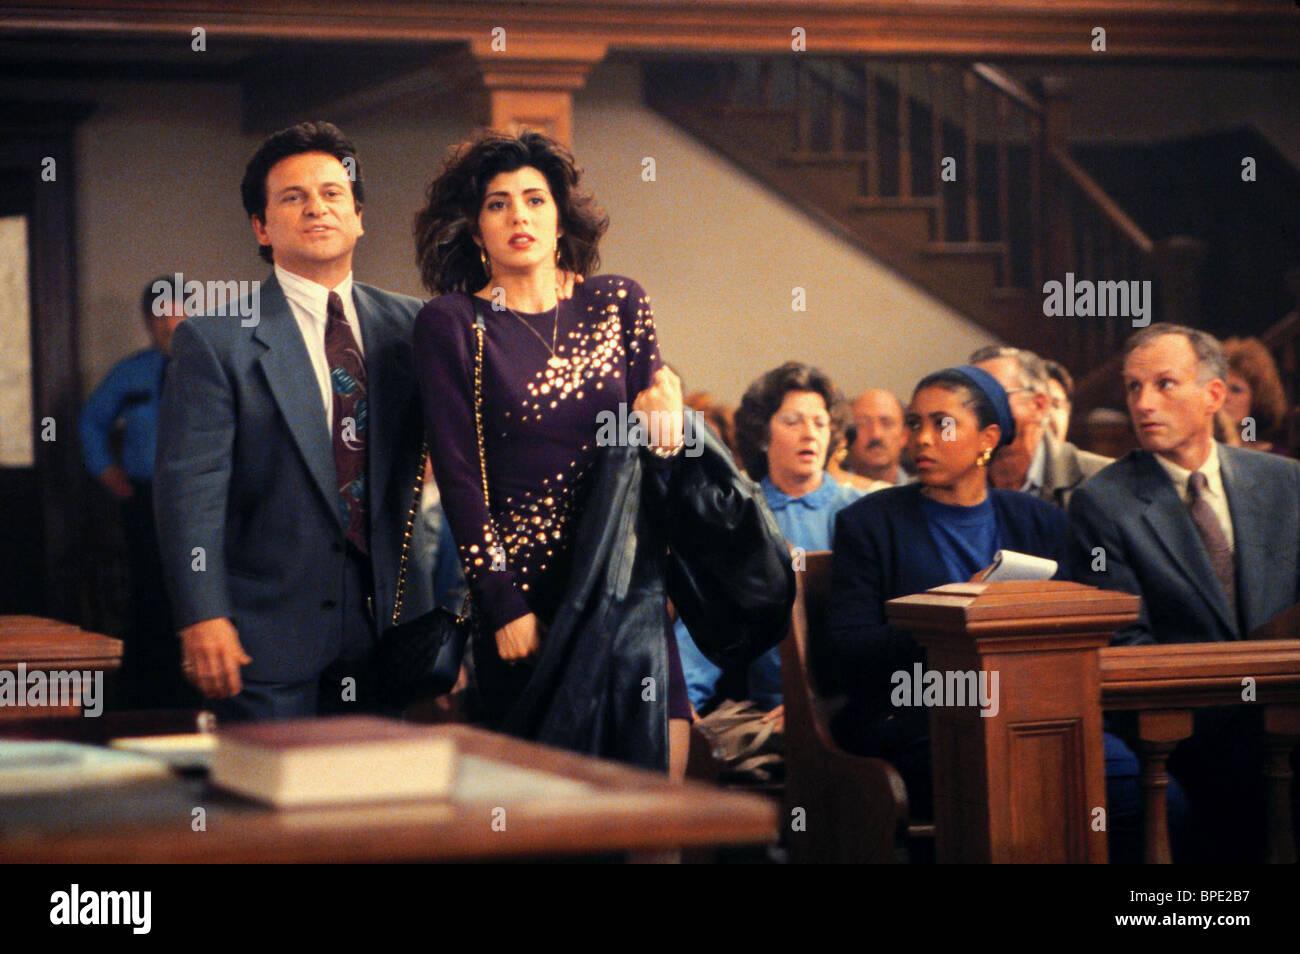 JOE PESCI, MARISA TOMEI, MY COUSIN VINNY, 1992 - Stock Image